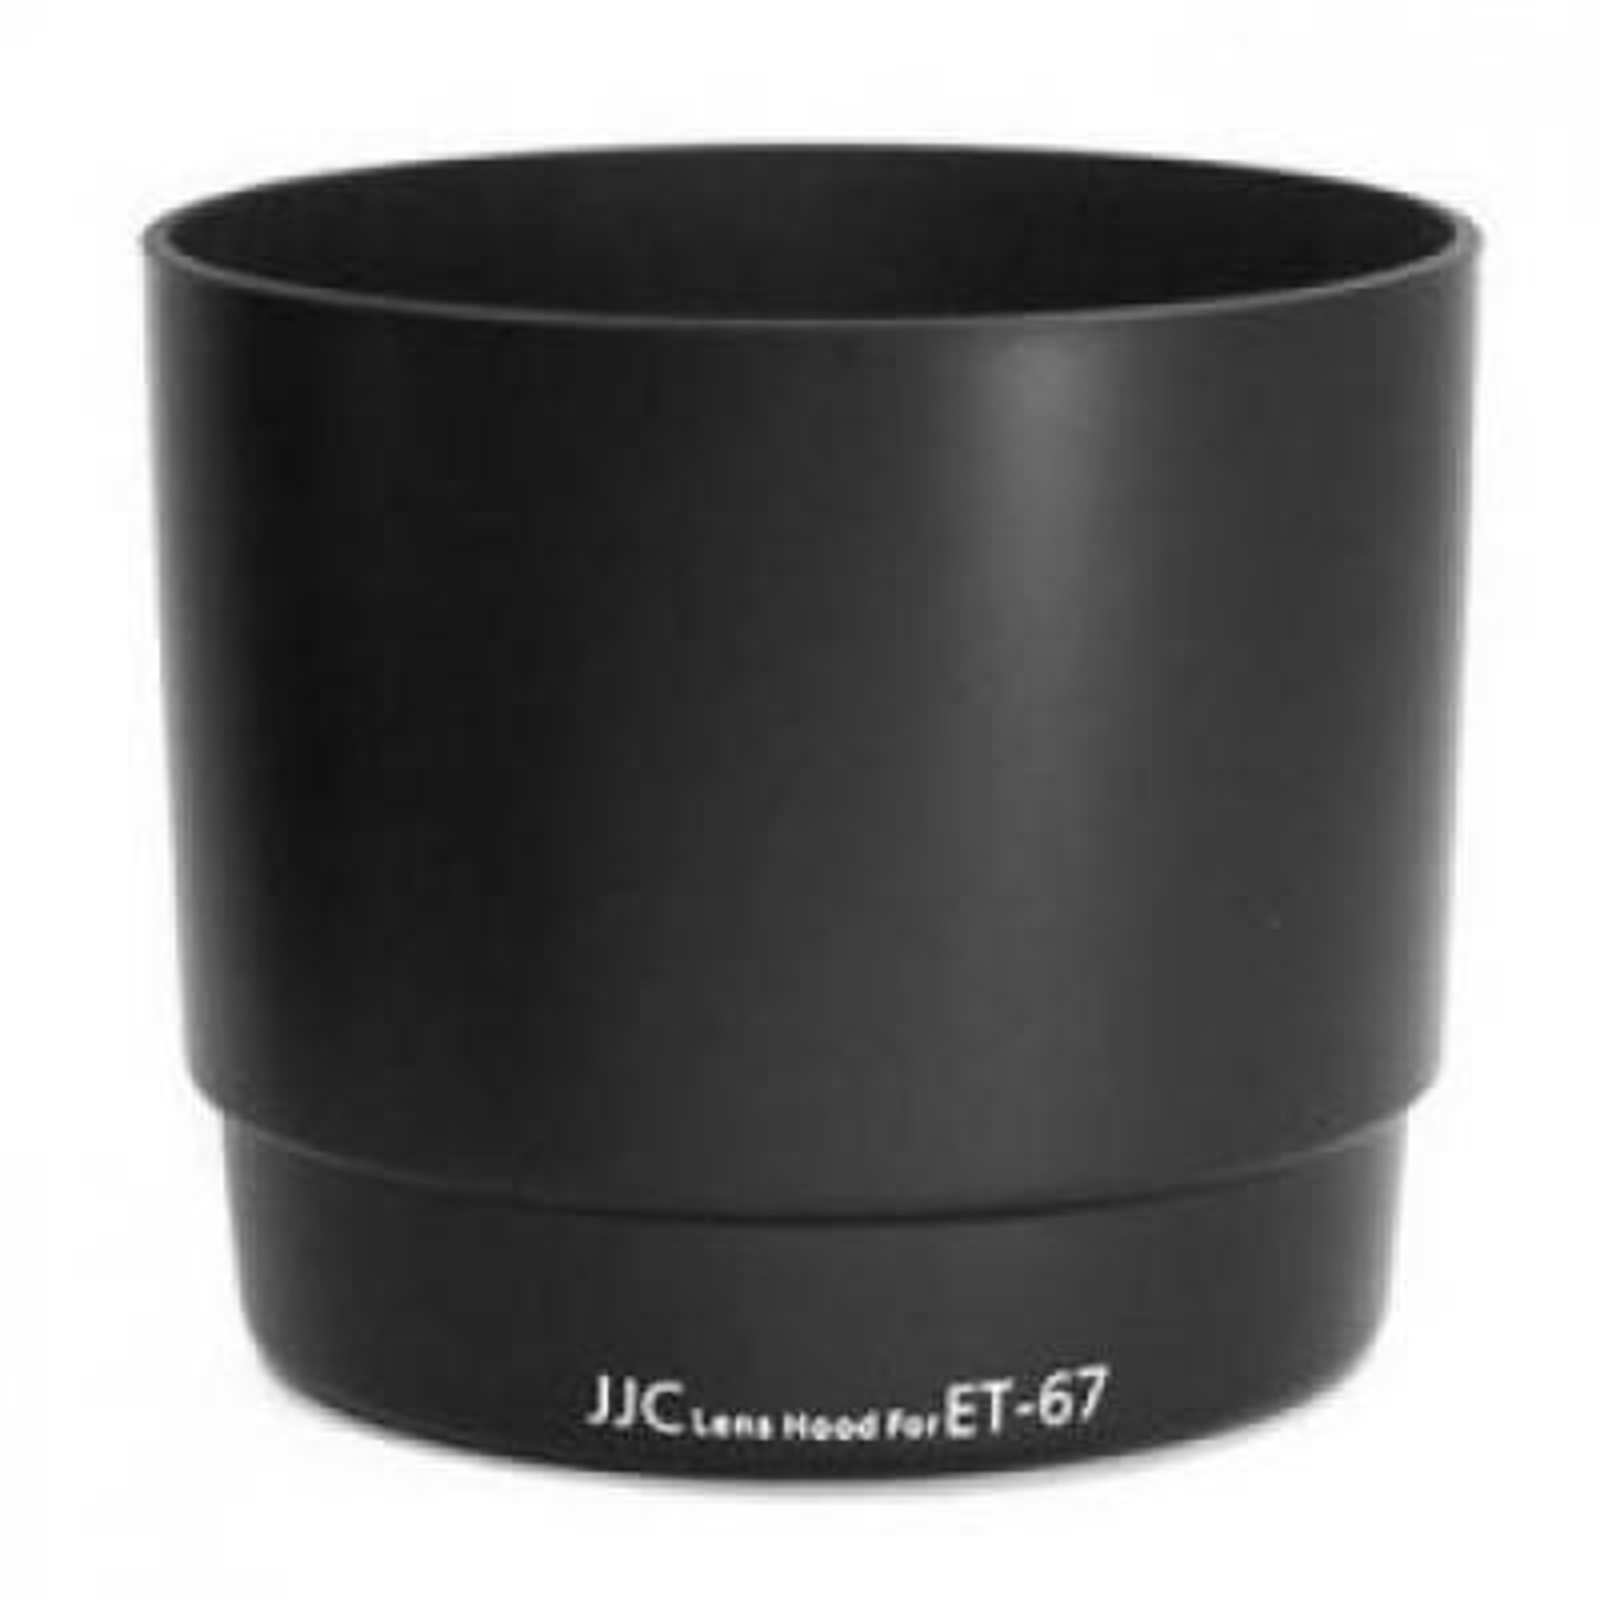 Бленда к объективу JJC LH-67 (Canon 100mm macro) (J-LH-67)